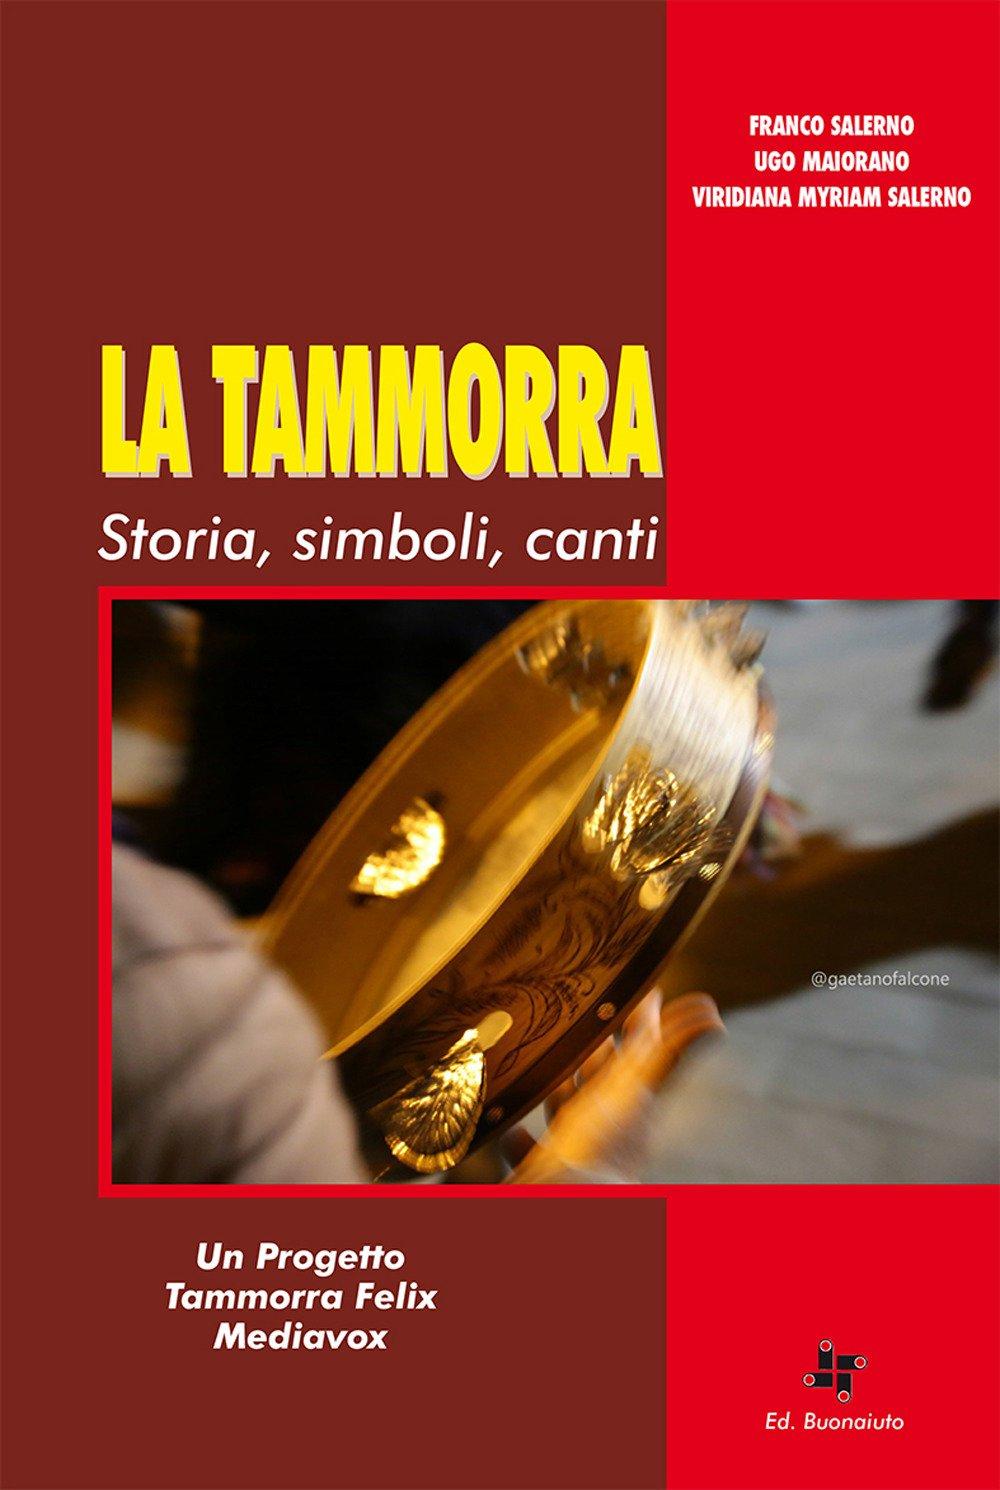 La tammorra. Storia, simboli, canti: Amazon.it: Salerno Maiorano Salerno,  Franco Ugo Viridiana Myriam, Maiorano, Ugo, Salerno, Viridiana Myriam: Libri